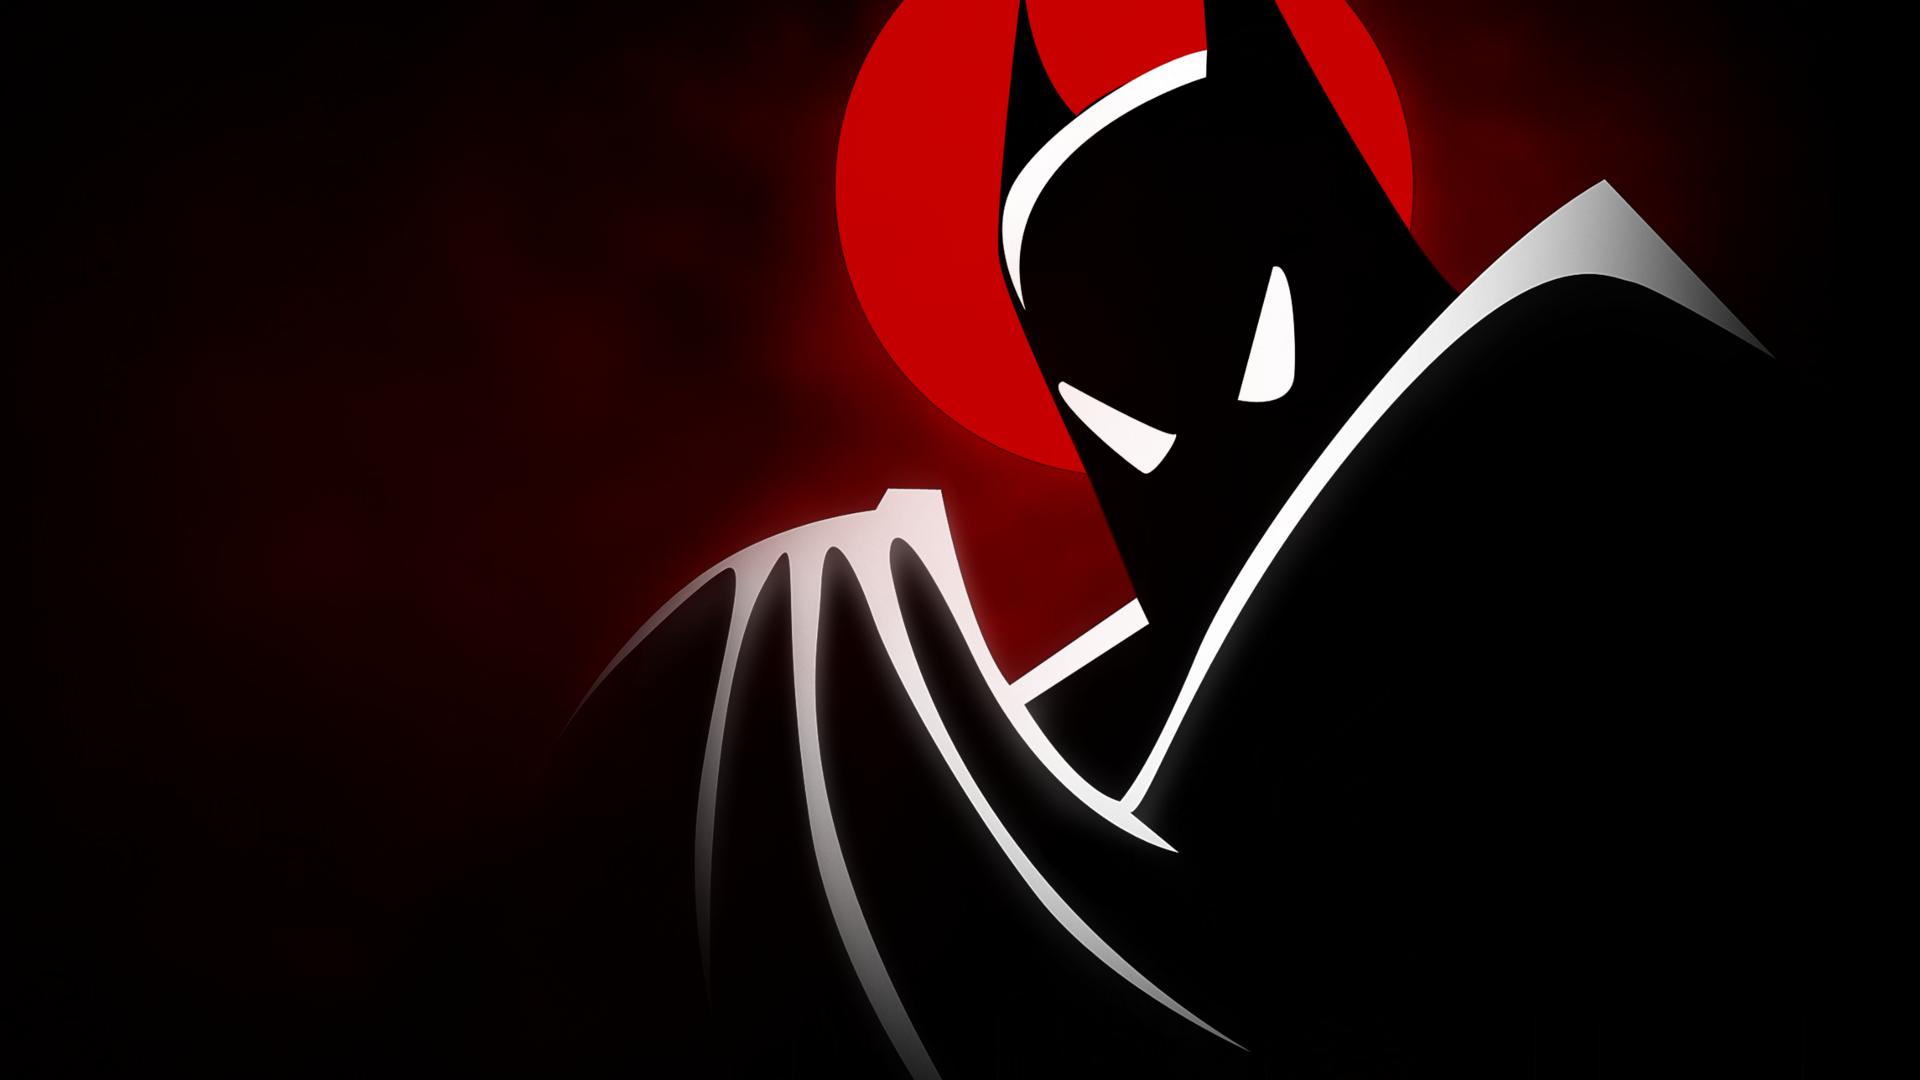 Batman The Animated Series Computer Wallpapers Desktop Backgrounds 1920x1080